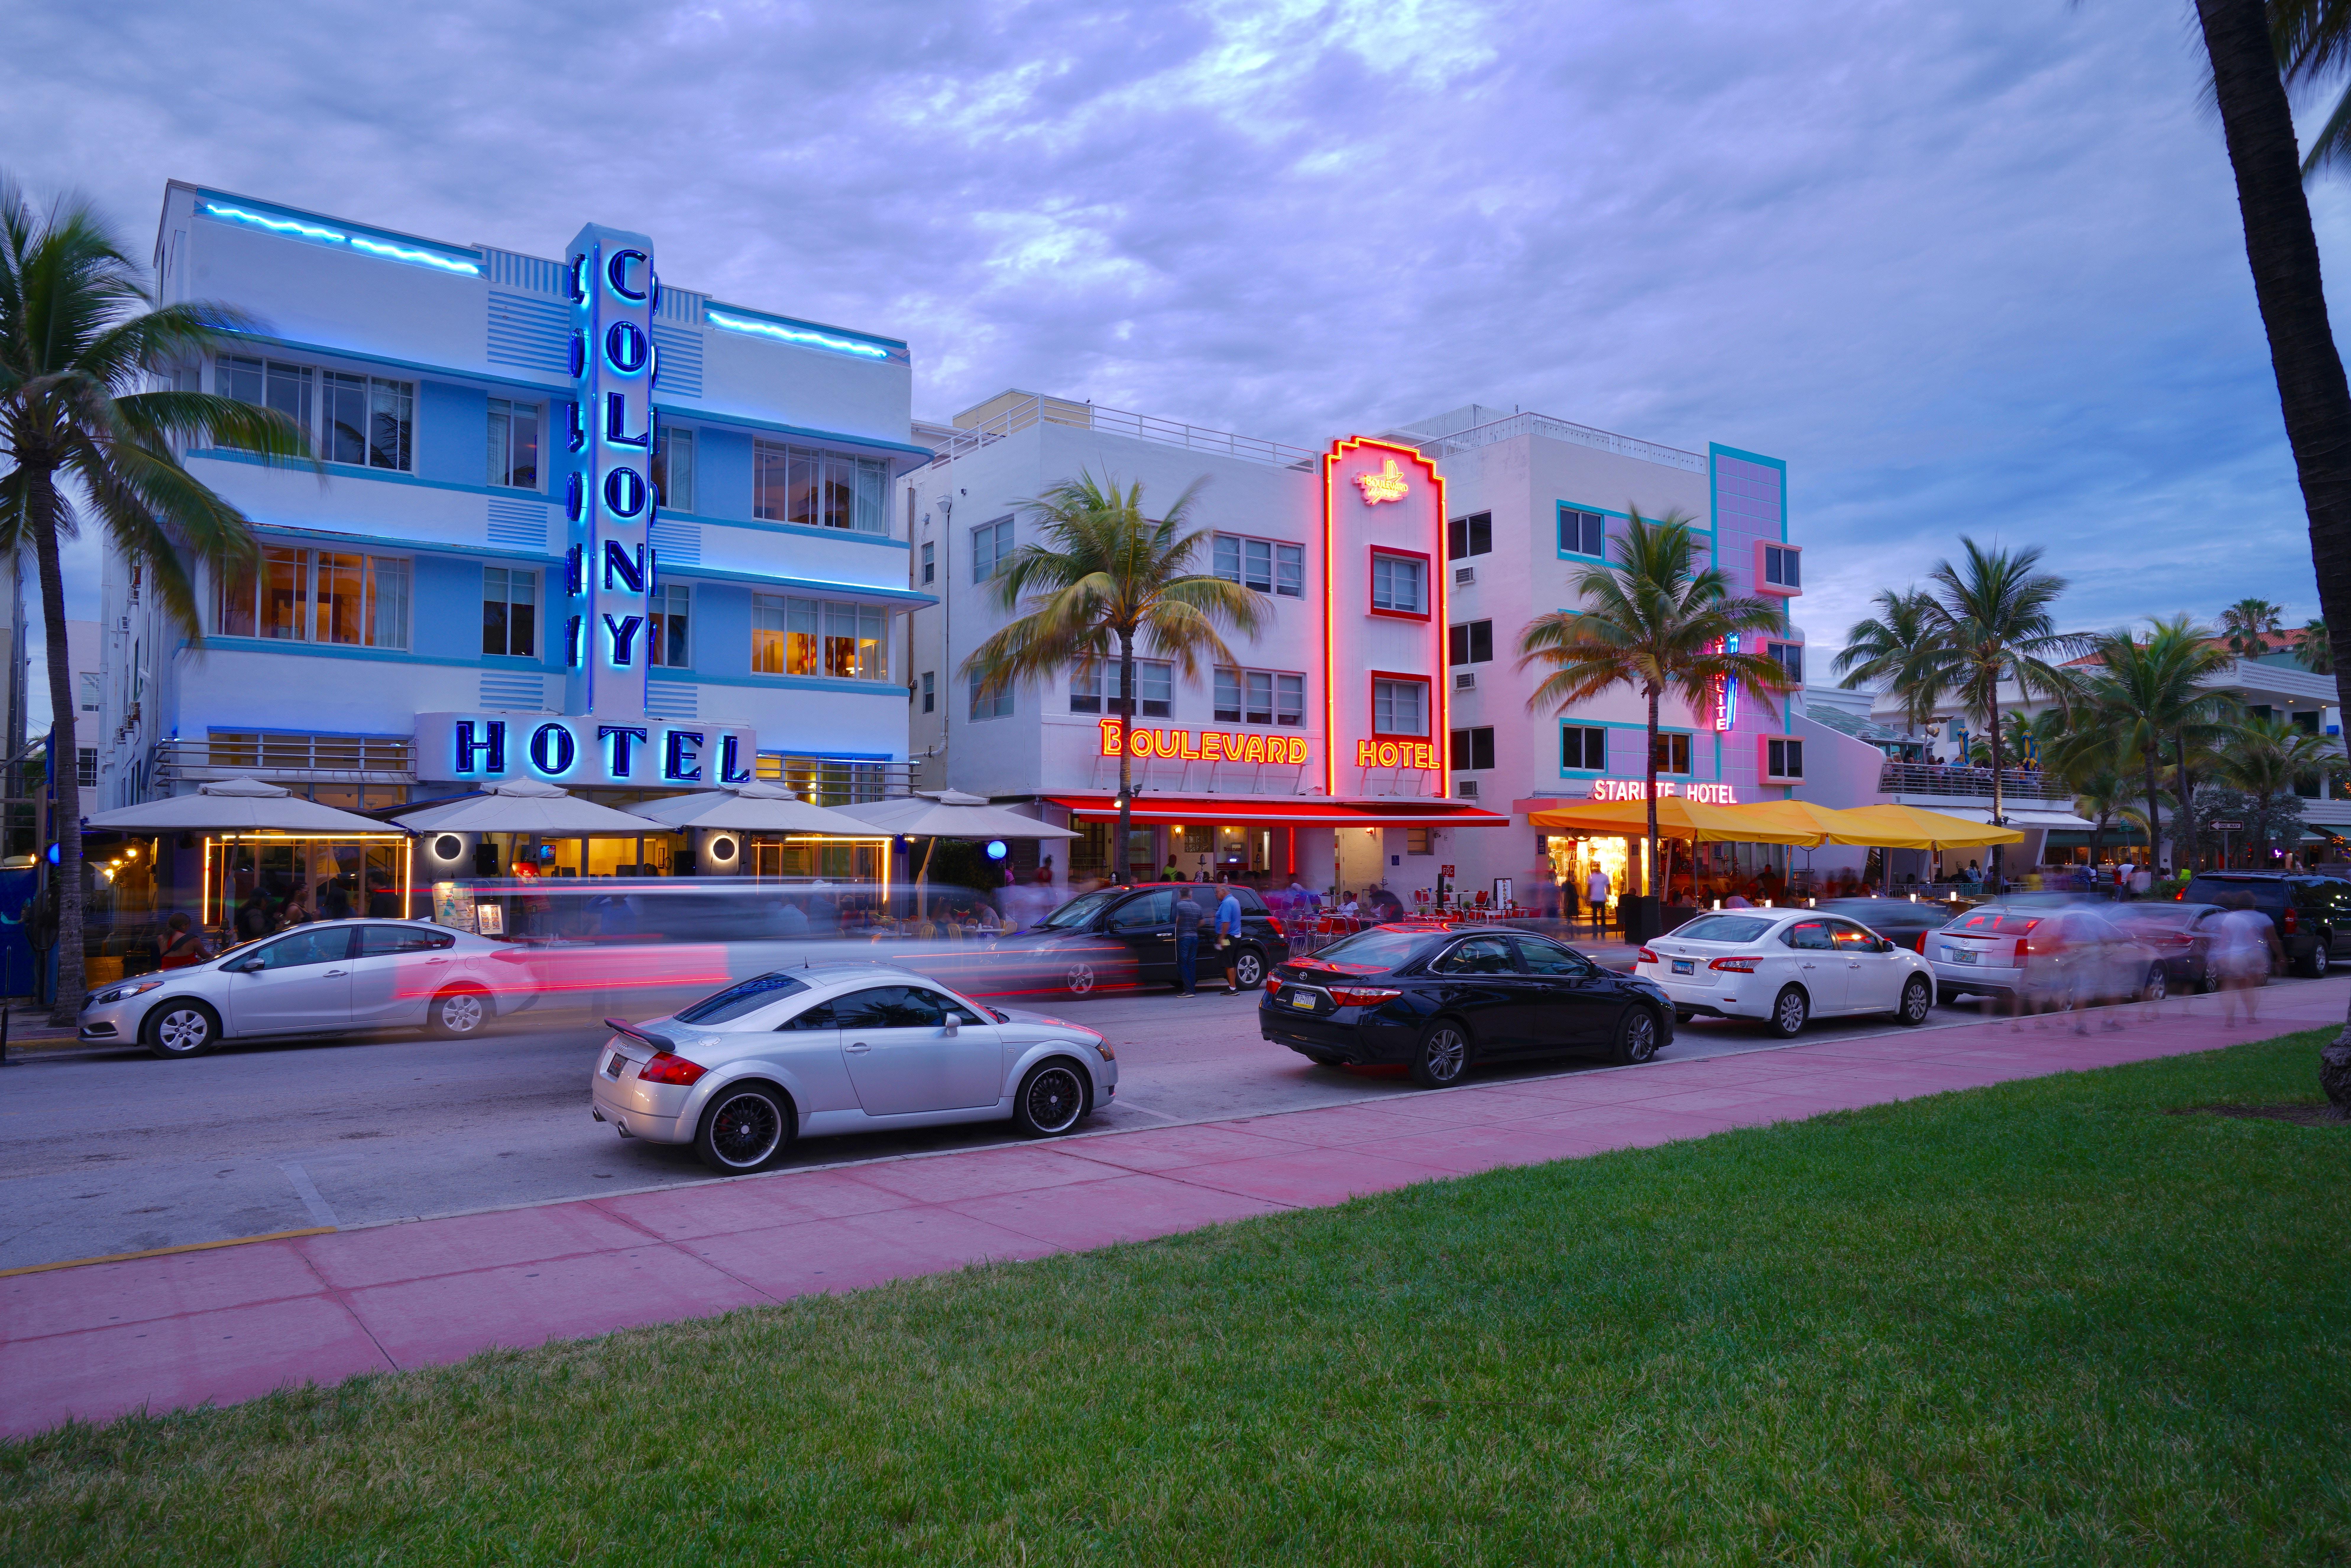 Picture of miami beach strip which includes the Colony Hotel